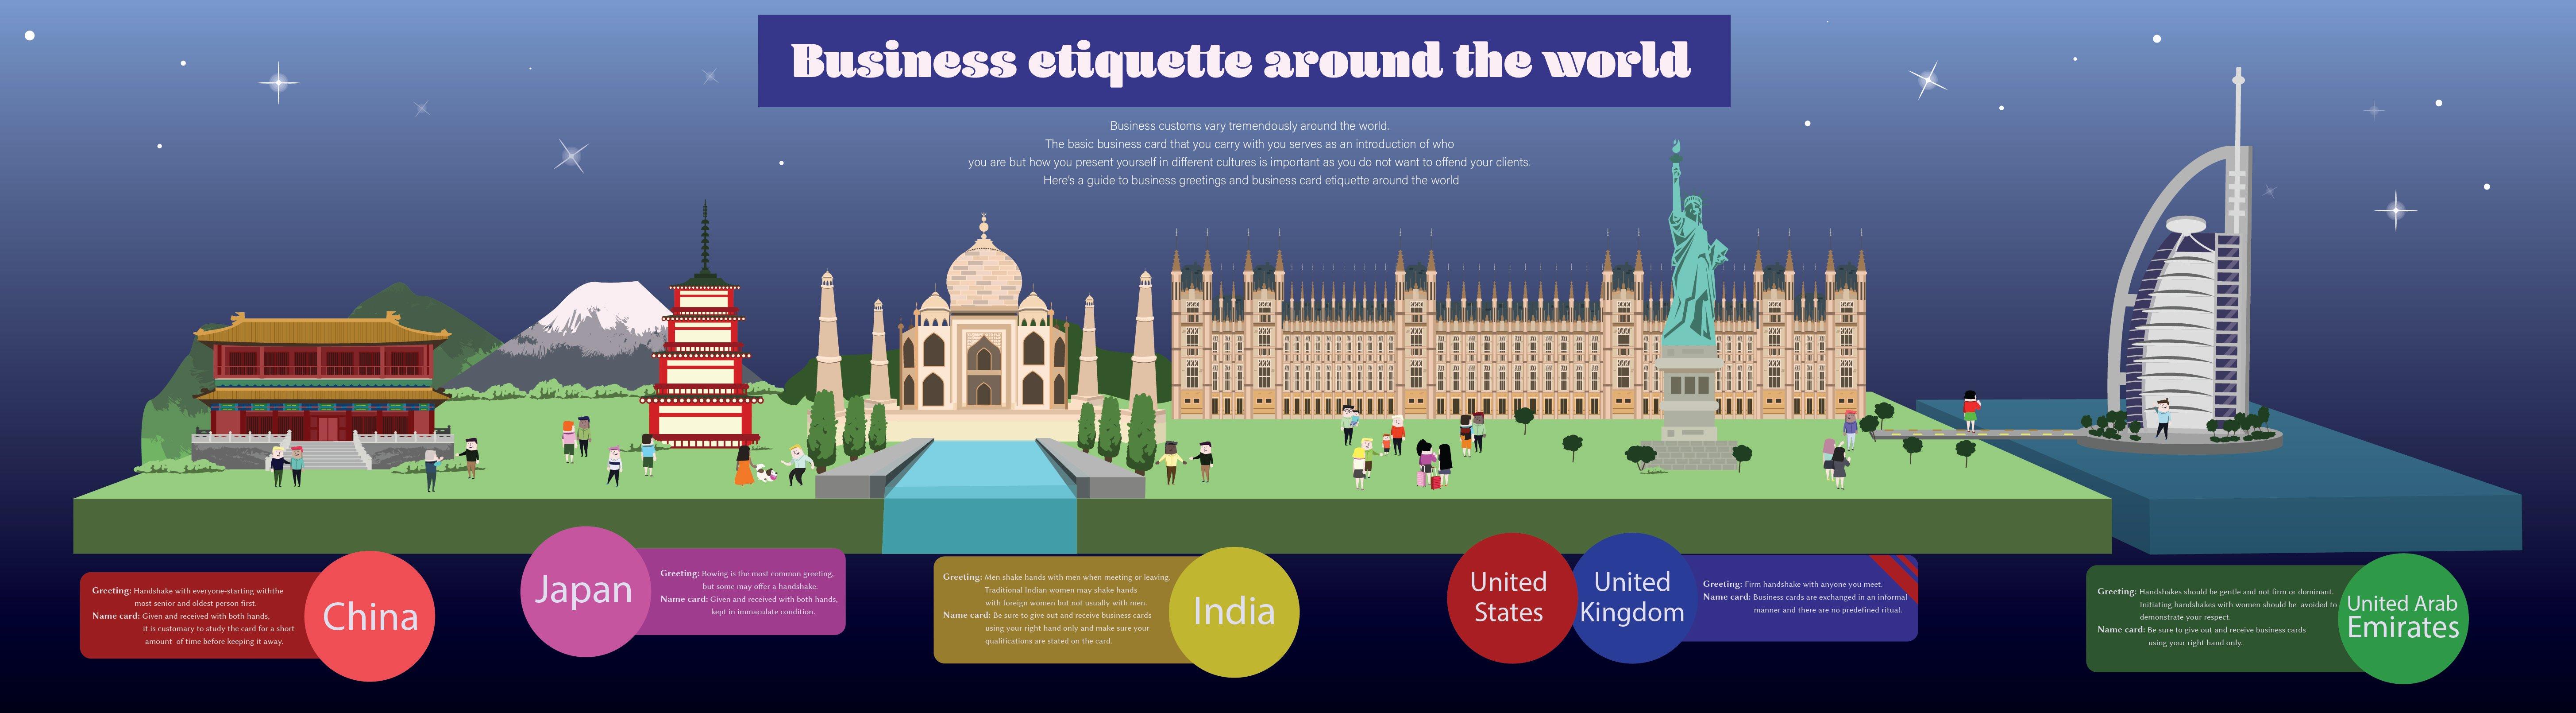 Business etiquette around the world_v2-01-01